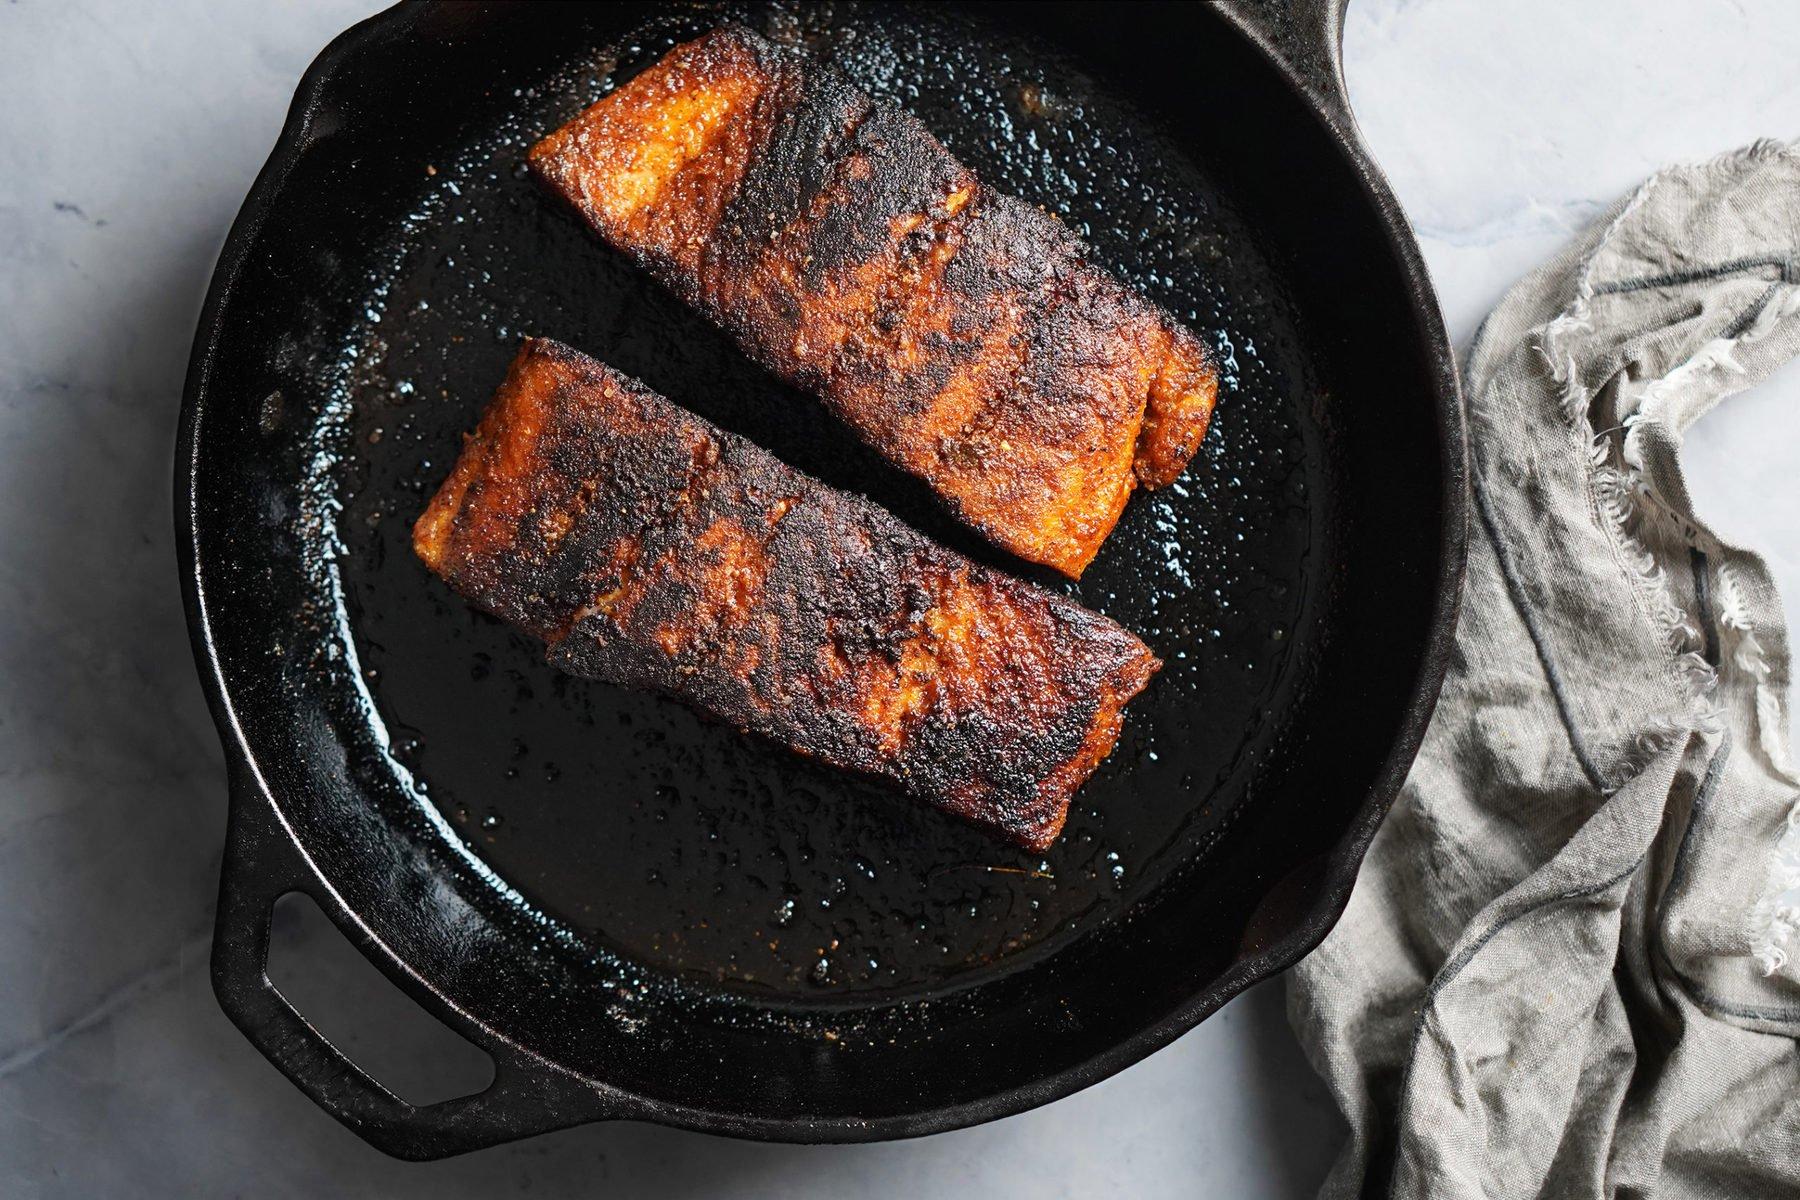 Blackened Salmon cooking on an iron skillet